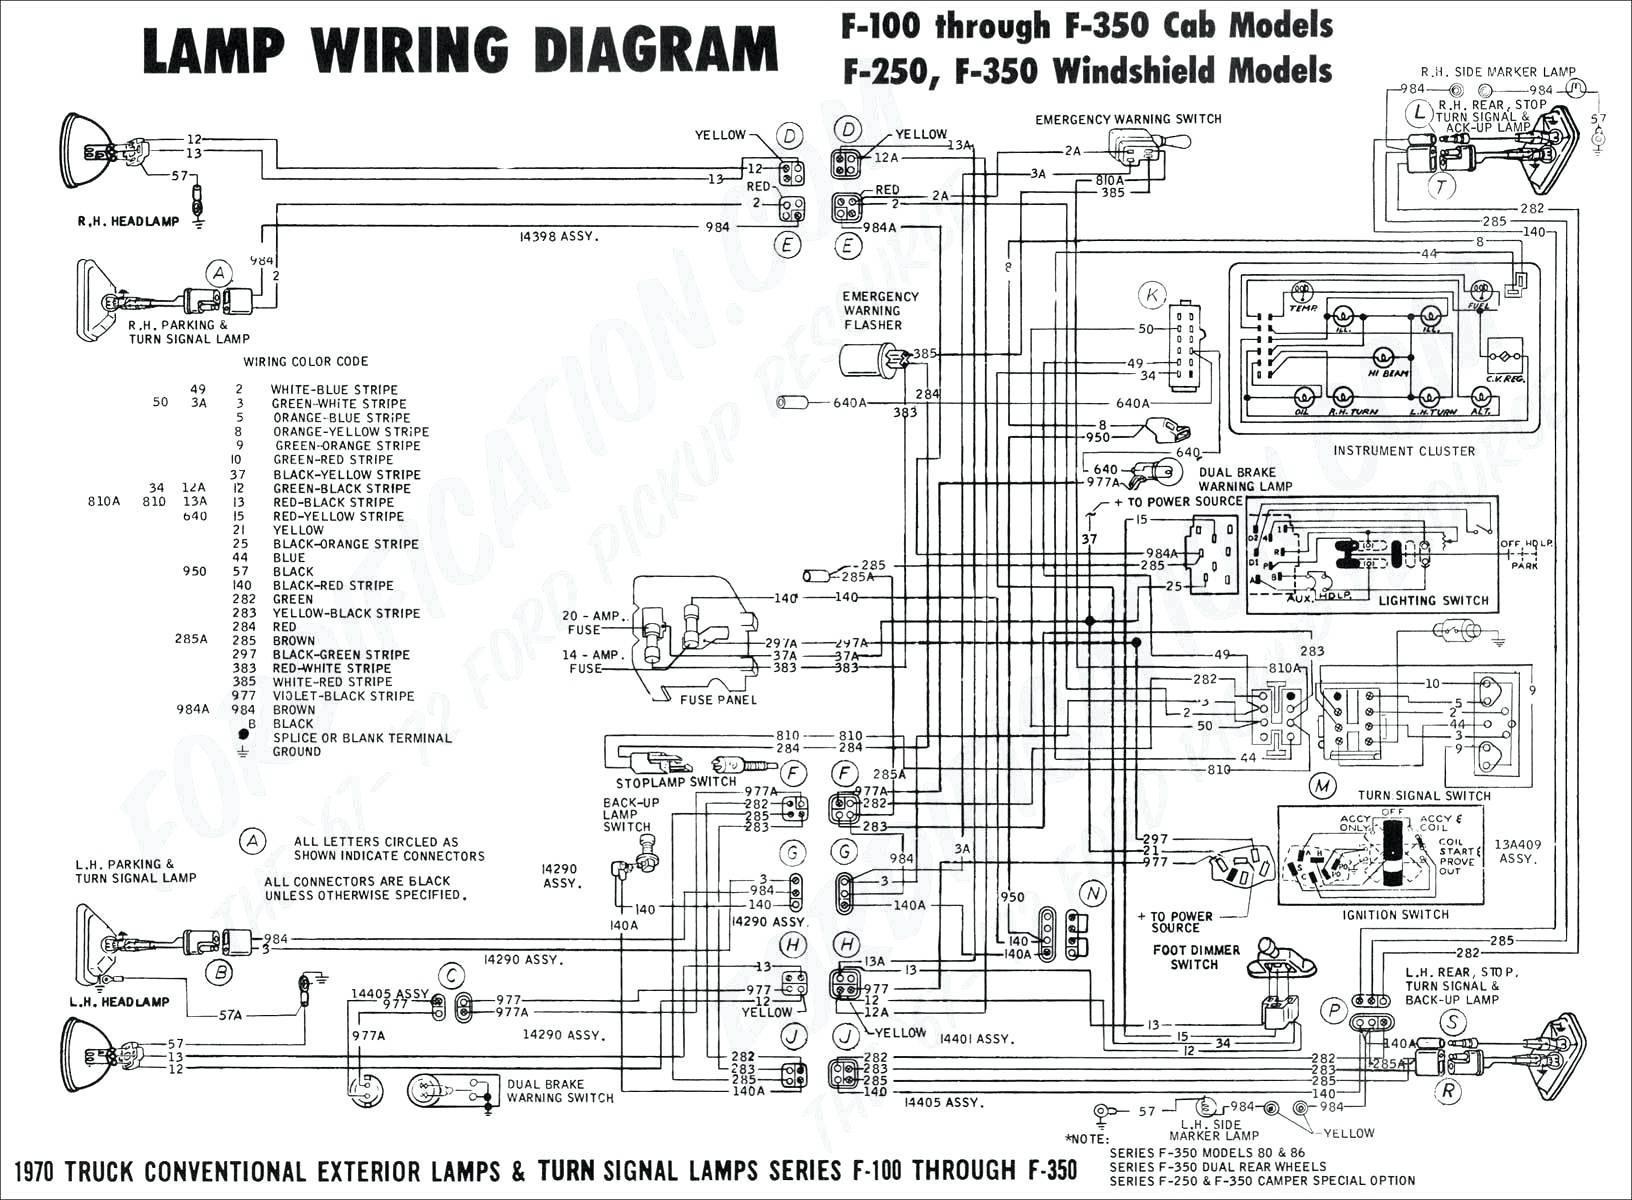 6.9 Diesel Glow Plug Wiring Diagram from detoxicrecenze.com